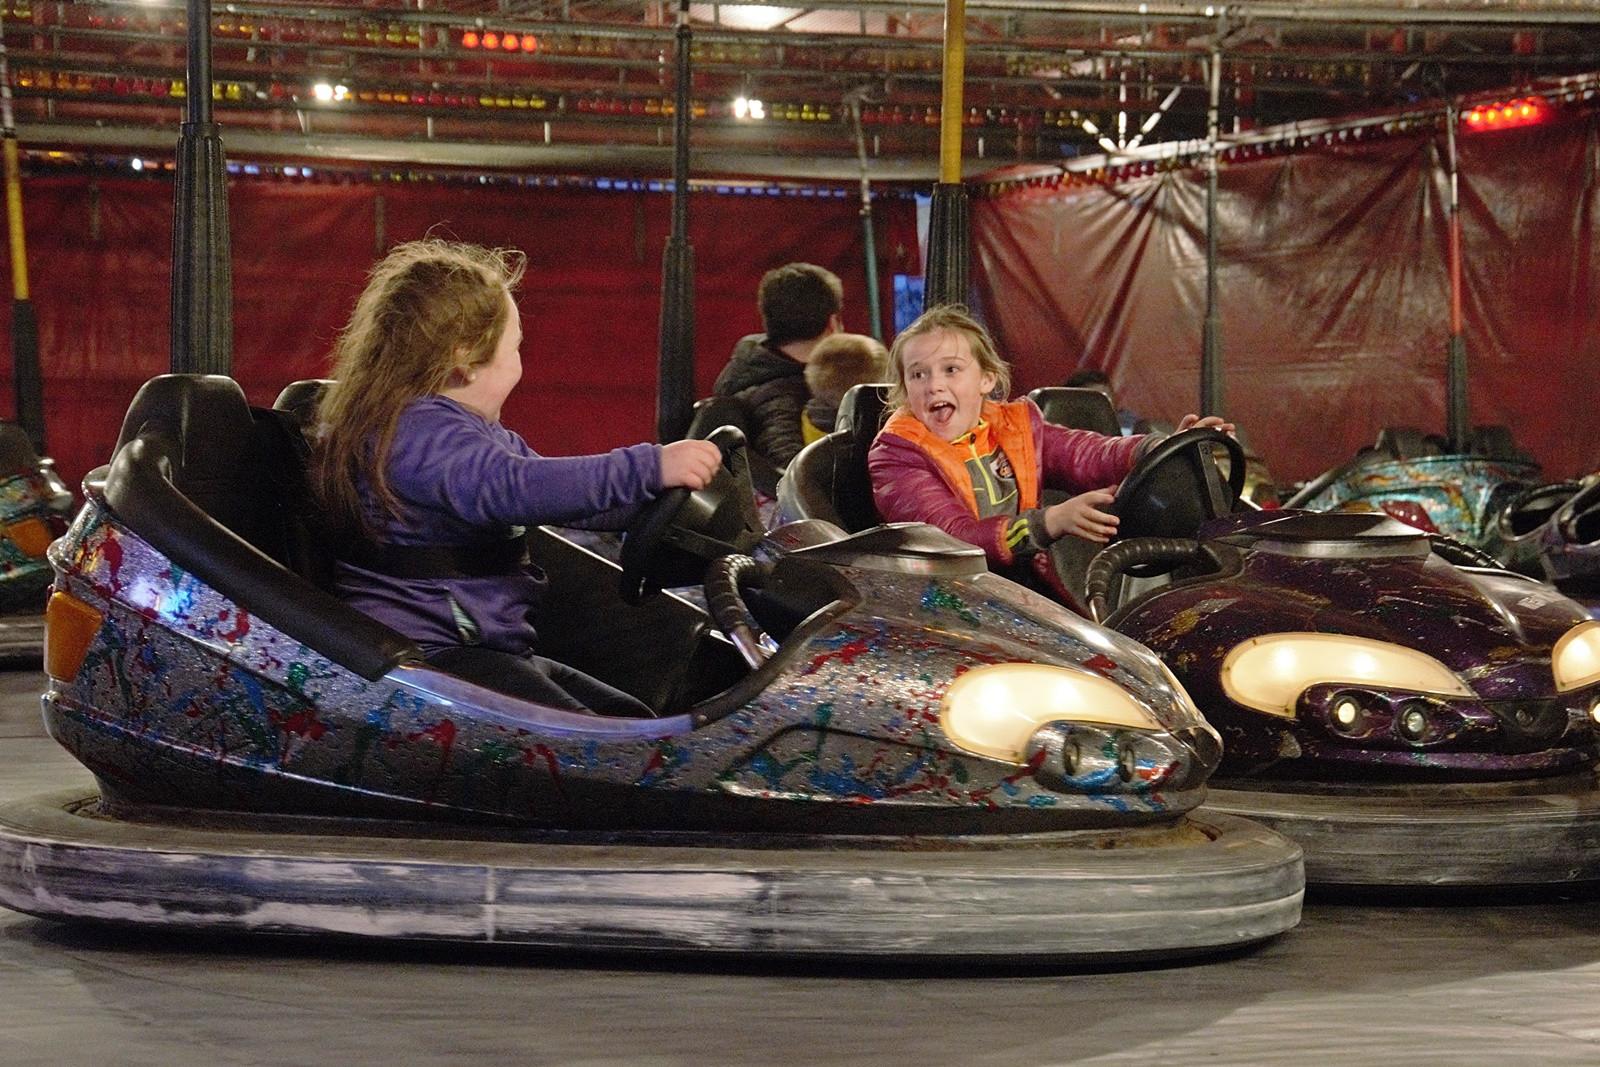 PDI - Fun at the Fair by Caroline Johnston (8 marks)